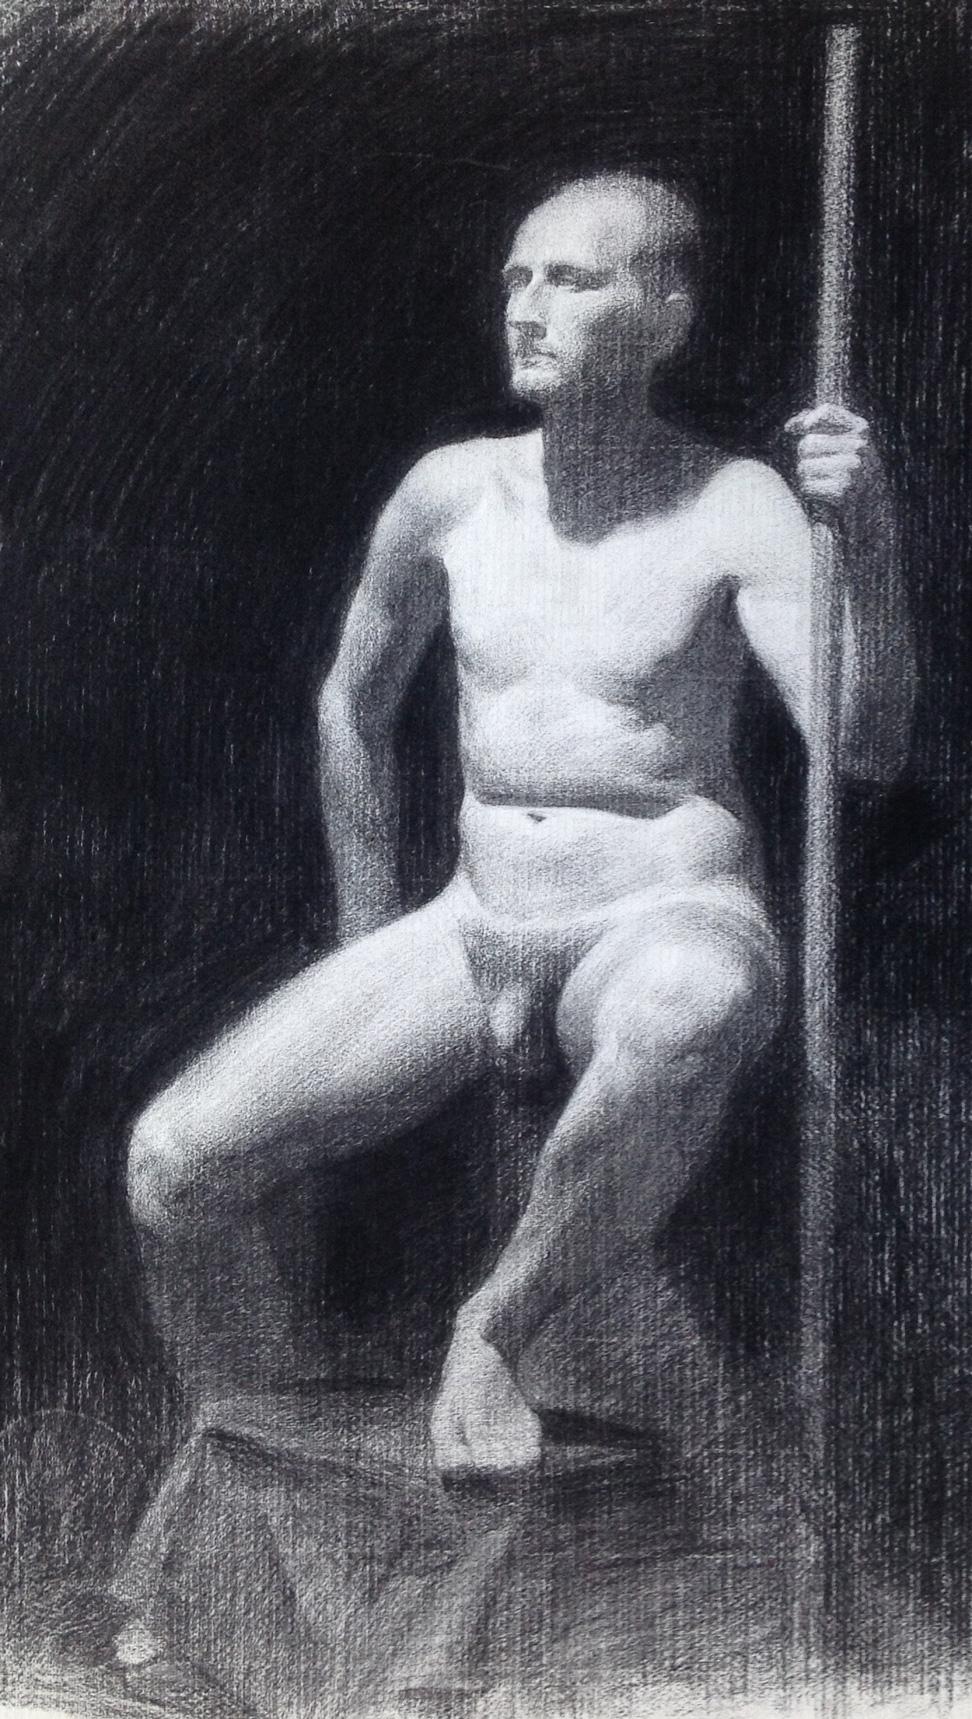 Scott-breton-Charcoal-study.jpg